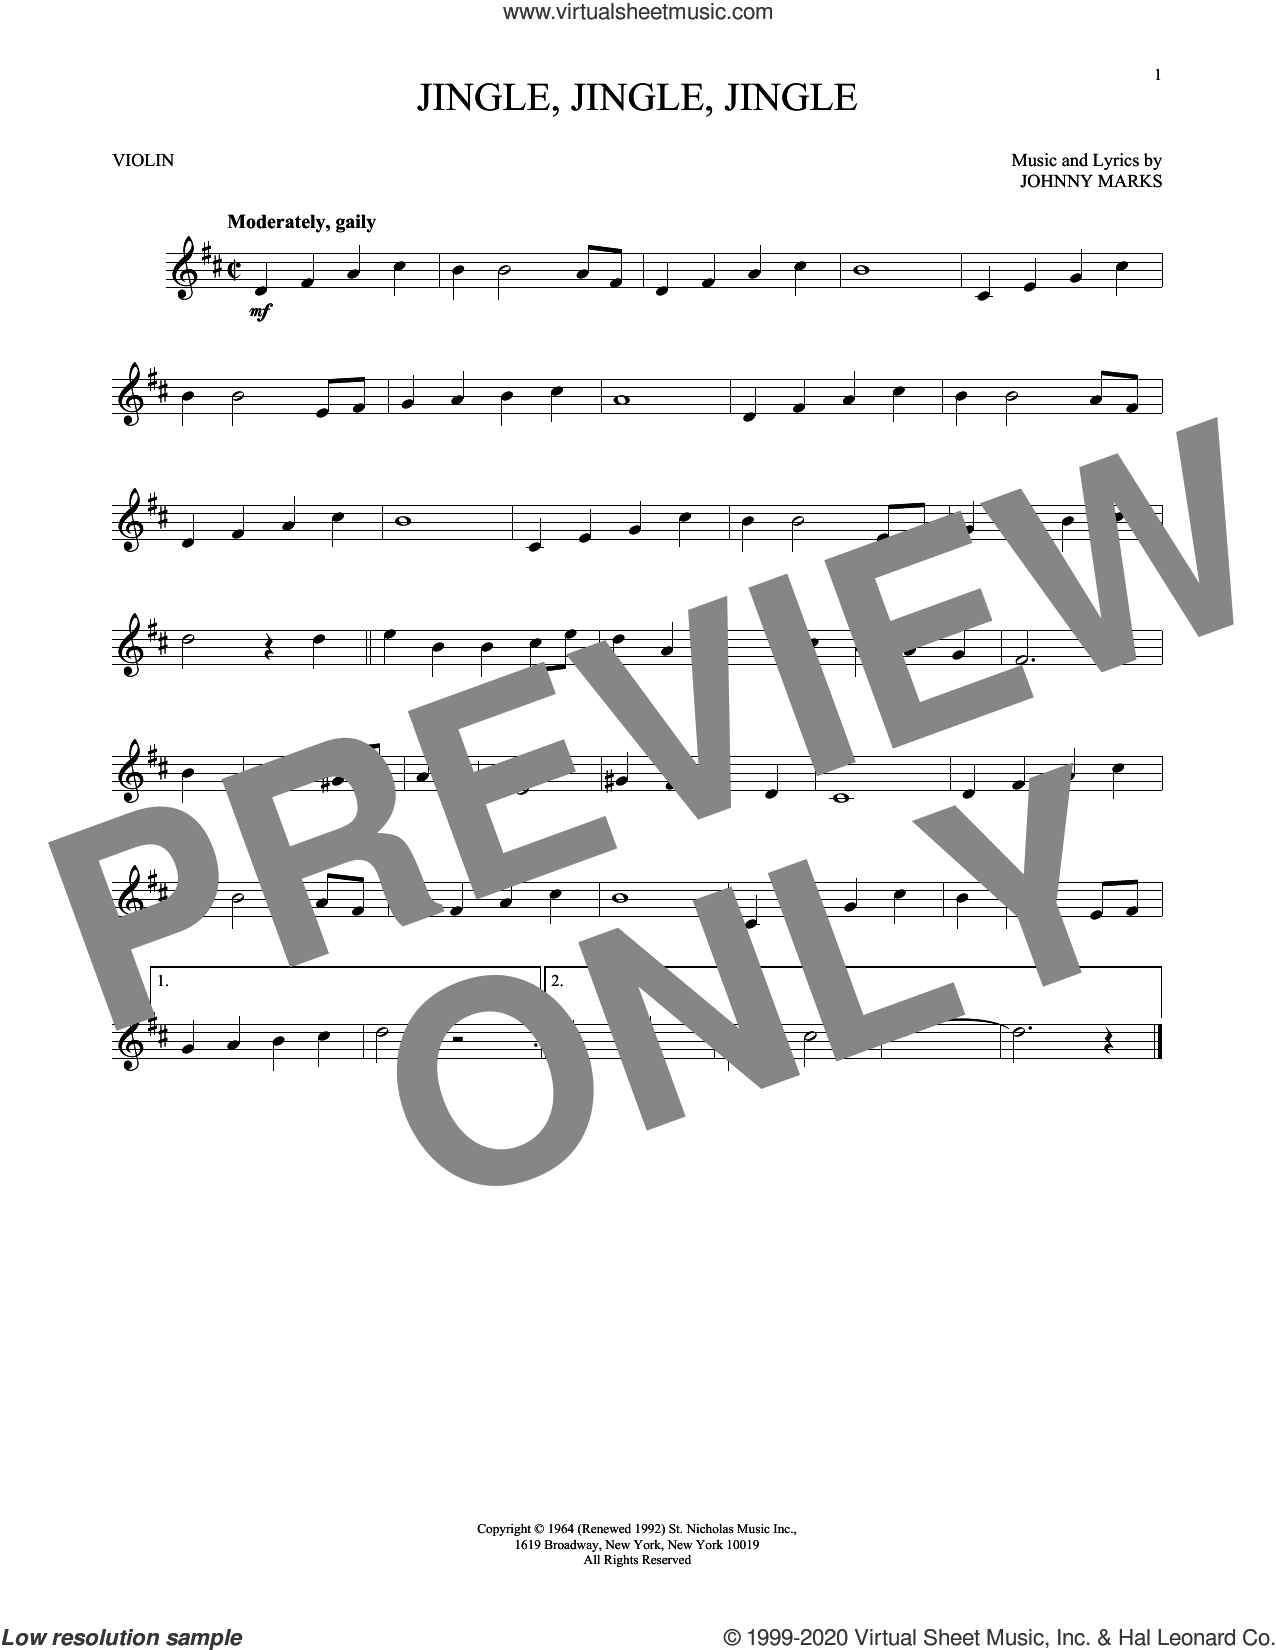 Jingle, Jingle, Jingle sheet music for violin solo by Johnny Marks, intermediate skill level